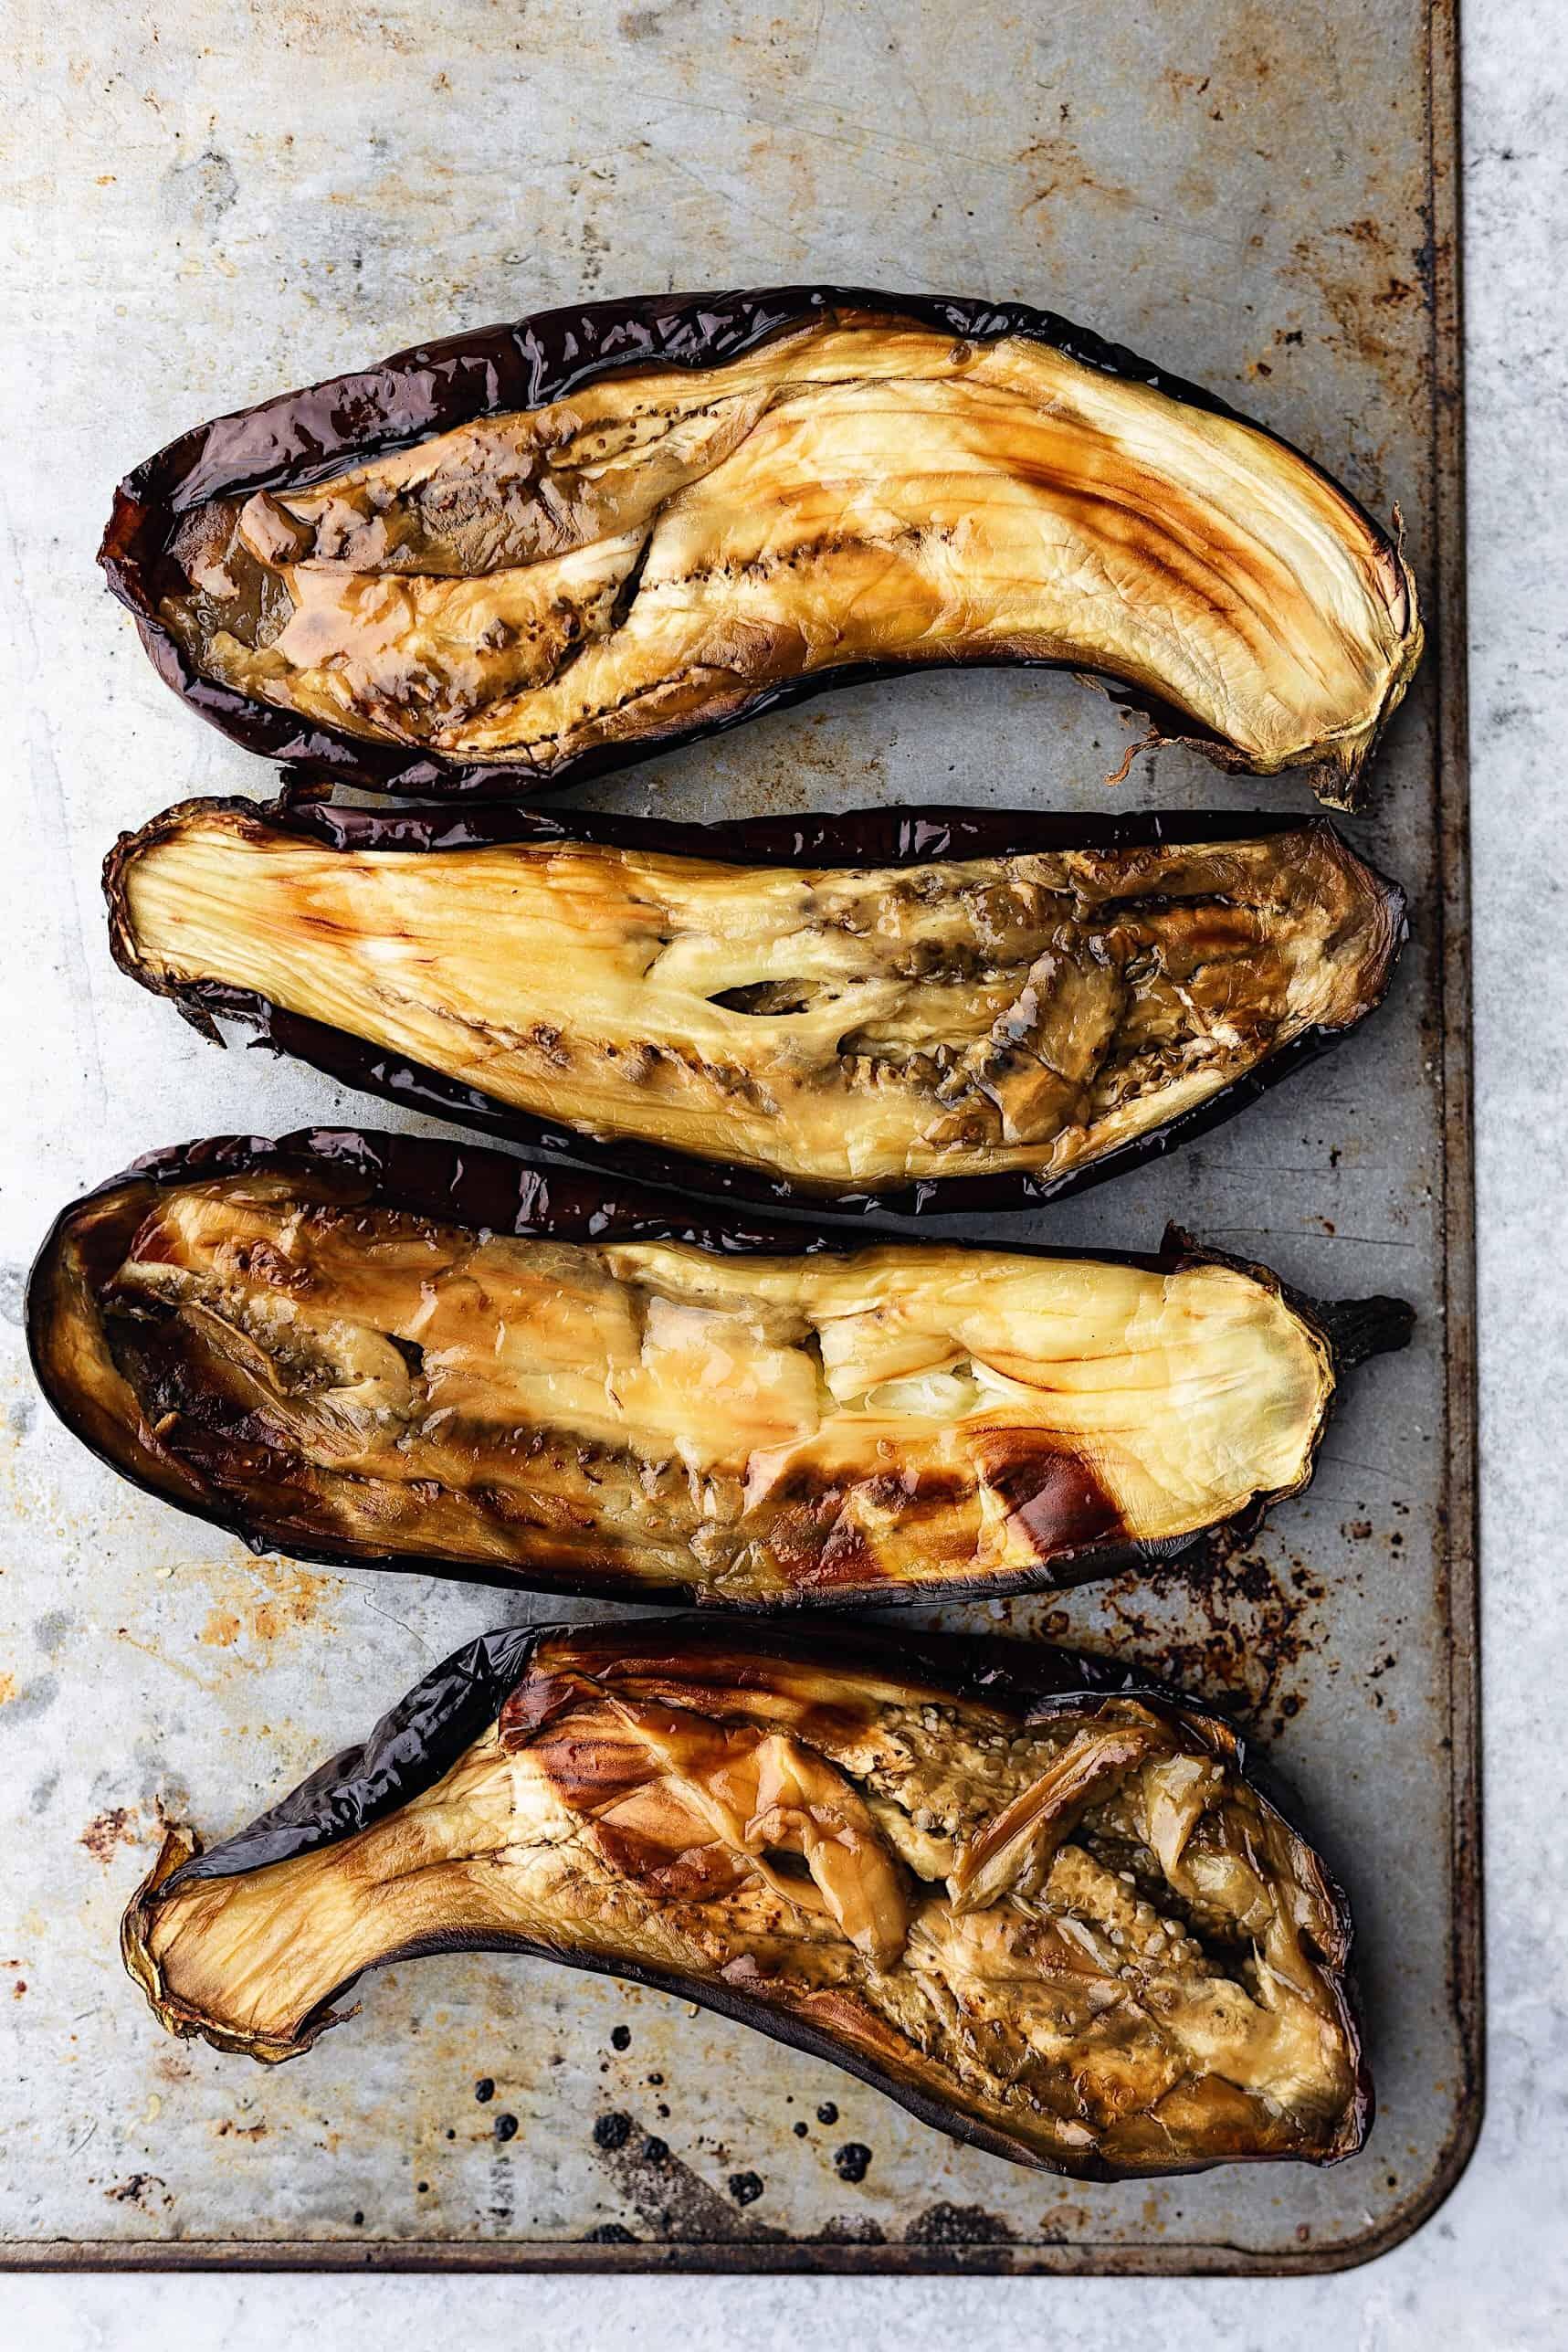 Smoky Roasted Eggplant Dip #eggplant #aubergine #vegan #recipe #dip